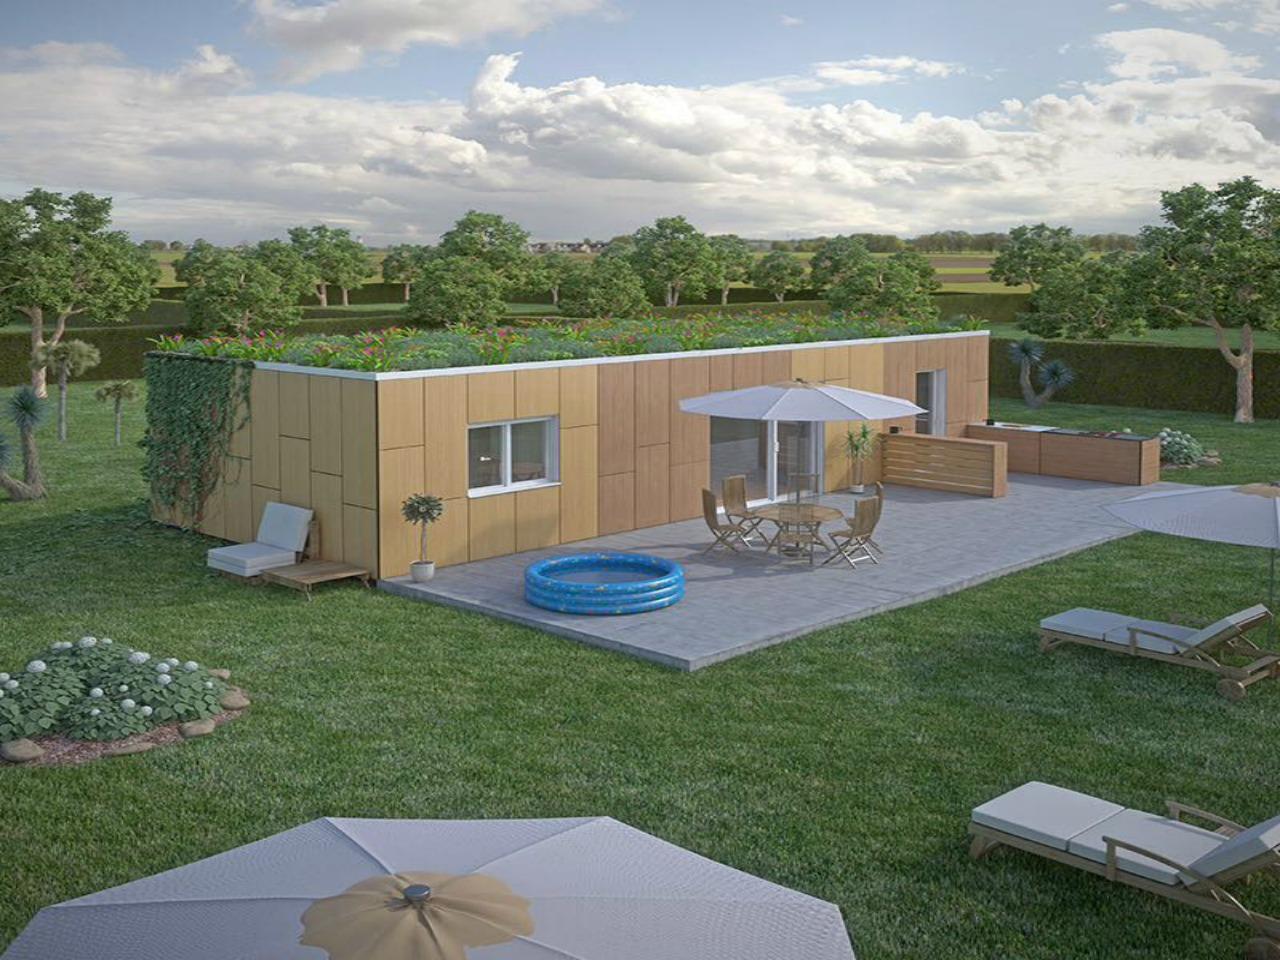 Movinghome casas modulares prefabricadas en c ceres casas modulares prefabricadas econ micas - Casas prefabricadas economicas ...